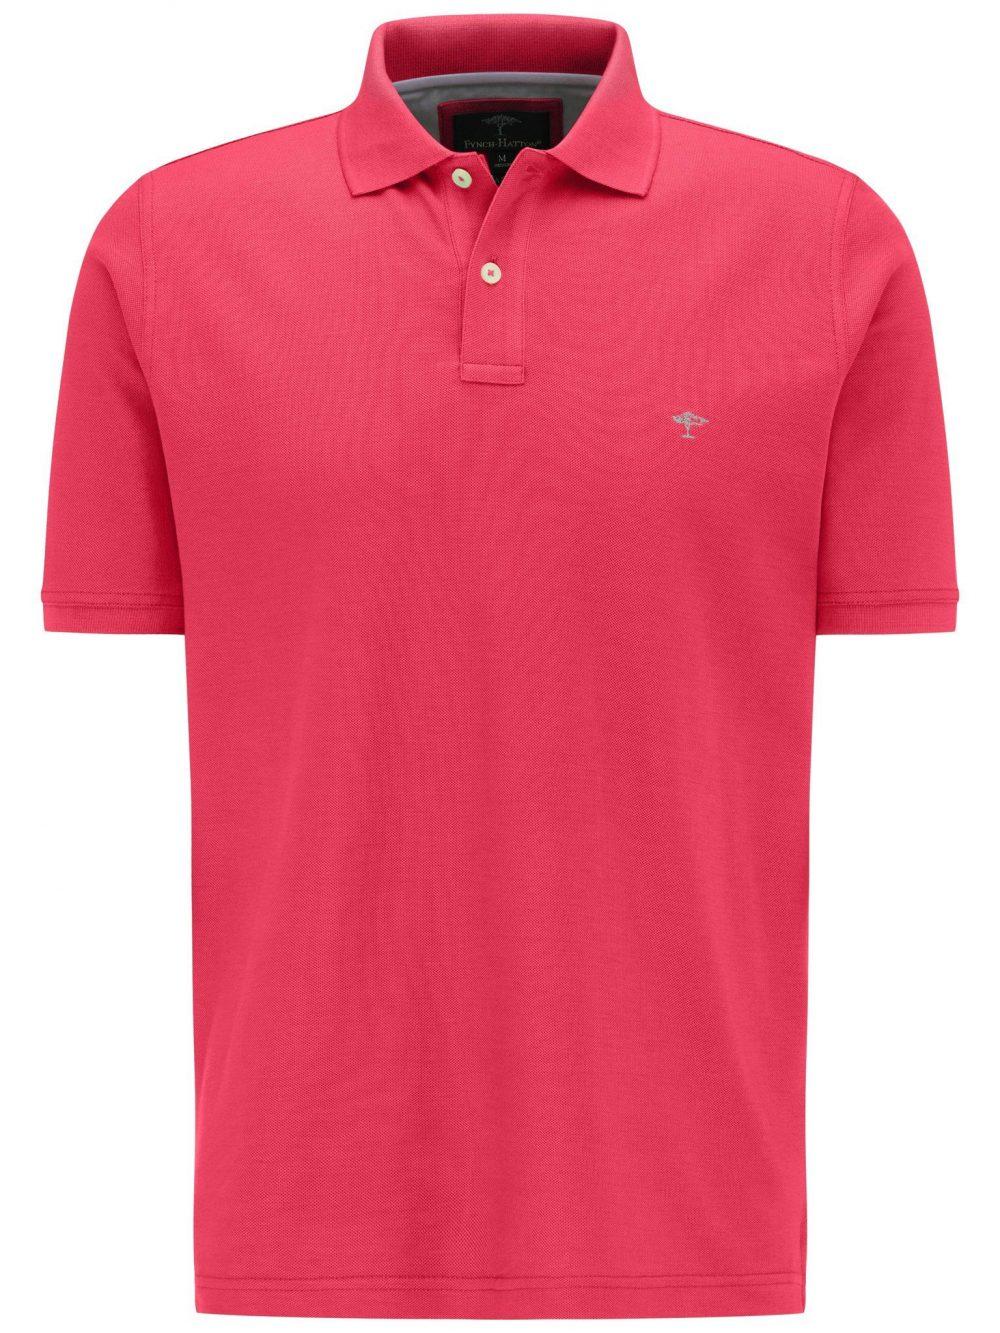 polo majica flamingo, fynch hatton, extra xxl shop